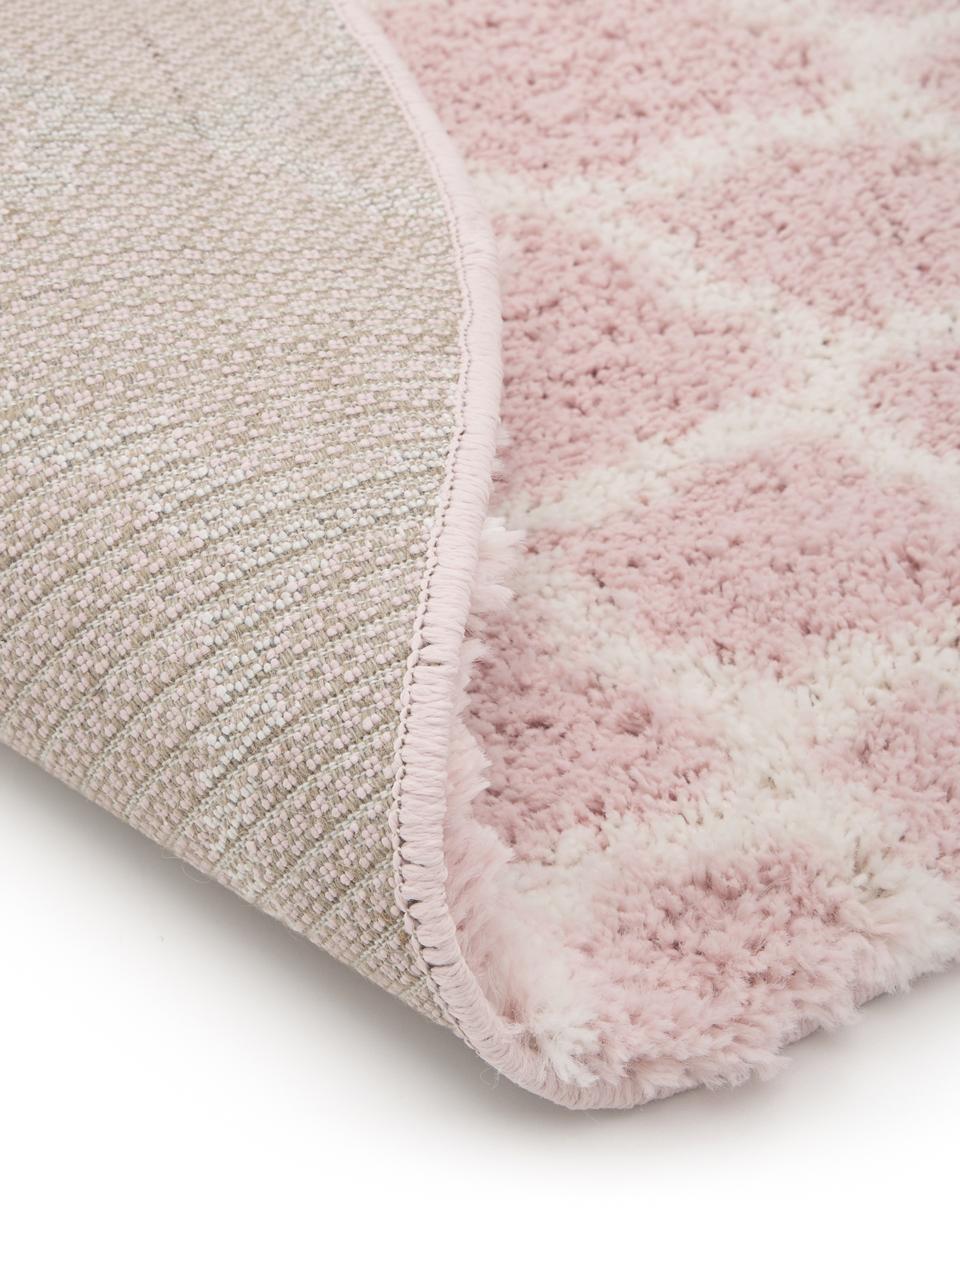 Hochflor-Teppich Mona in Altrosa/Cremeweiß, Flor: 100% Polypropylen, Altrosa, Cremeweiß, Ø 150 cm (Größe M)